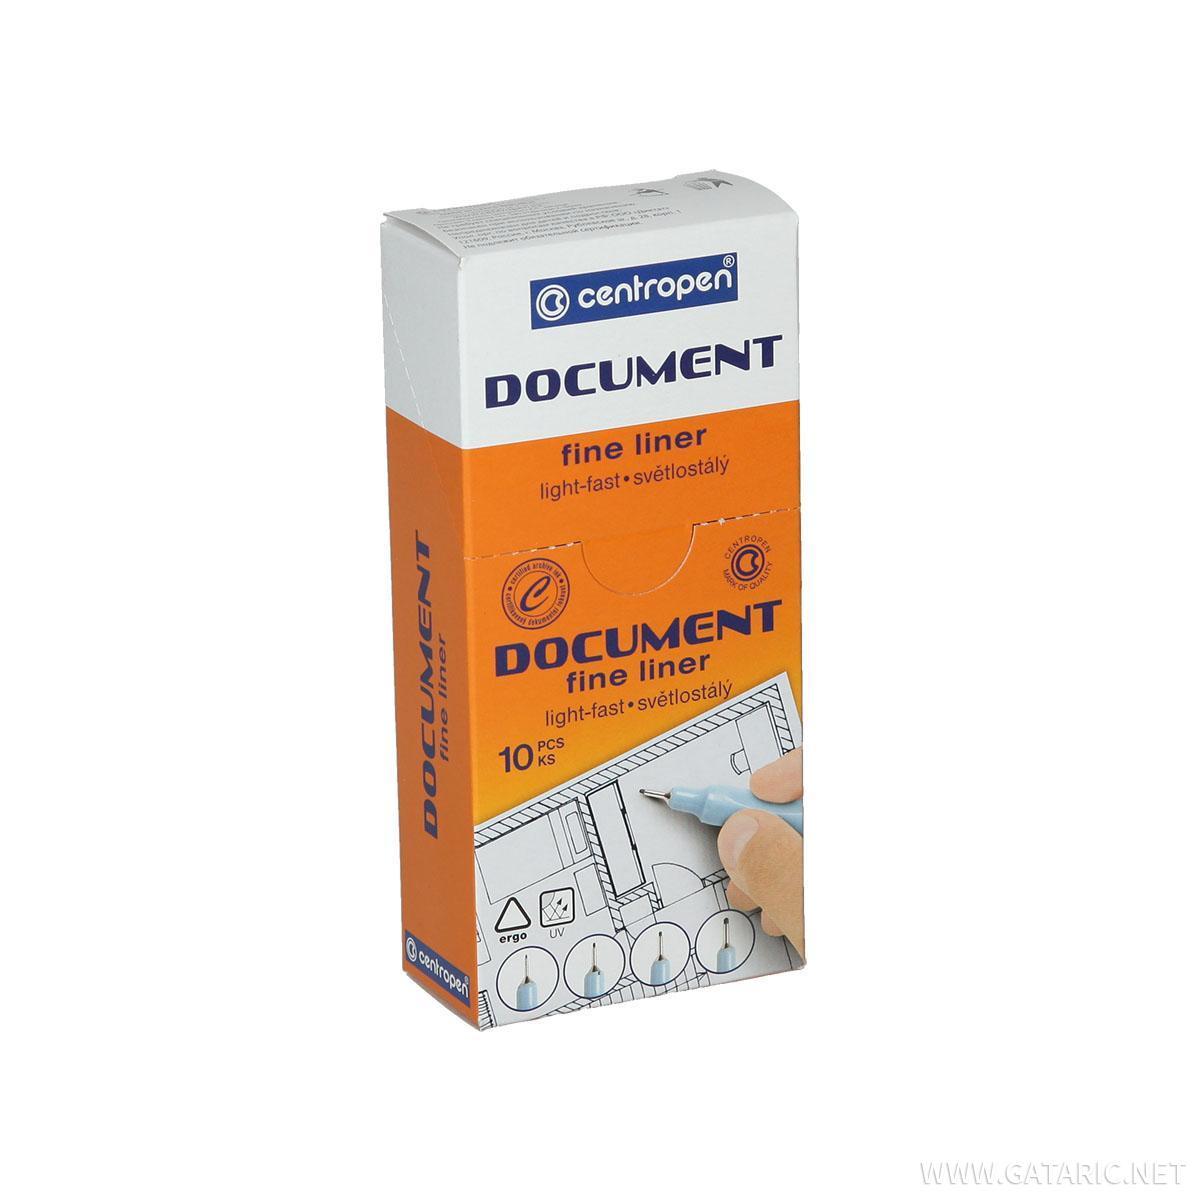 Liner document, 0.7mm